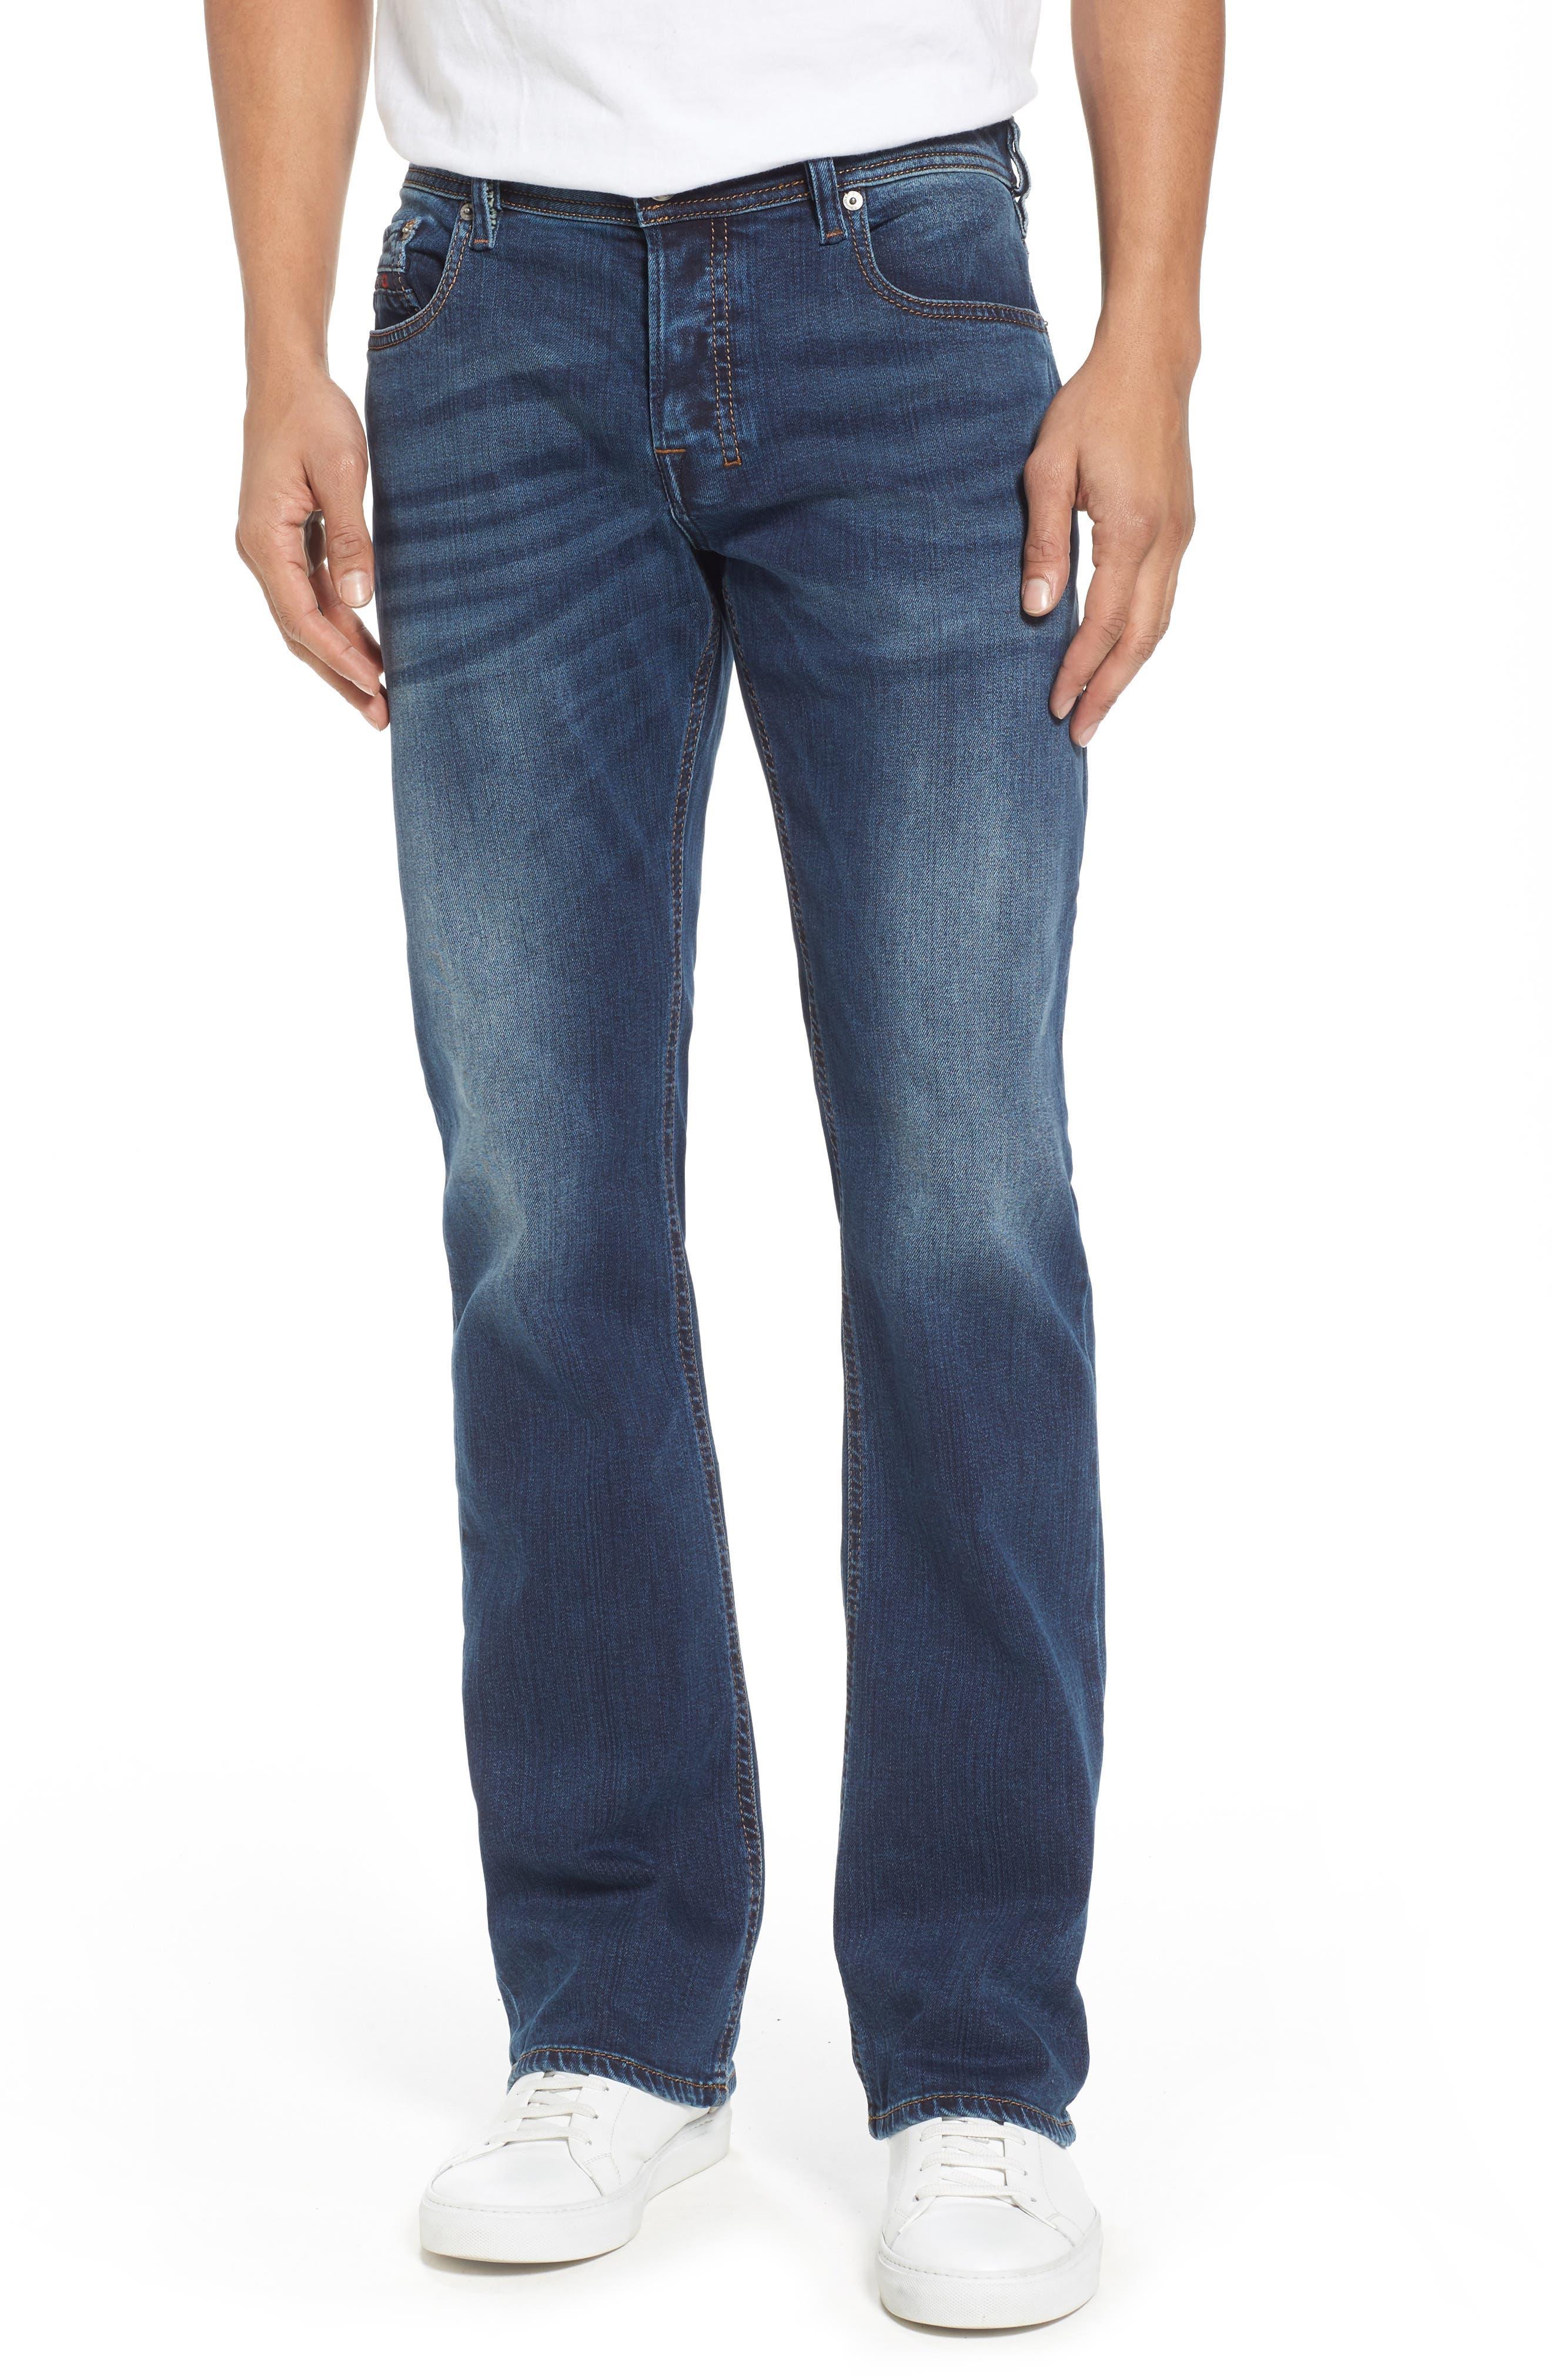 Zatiny Bootcut Jeans,                             Main thumbnail 1, color,                             084BU